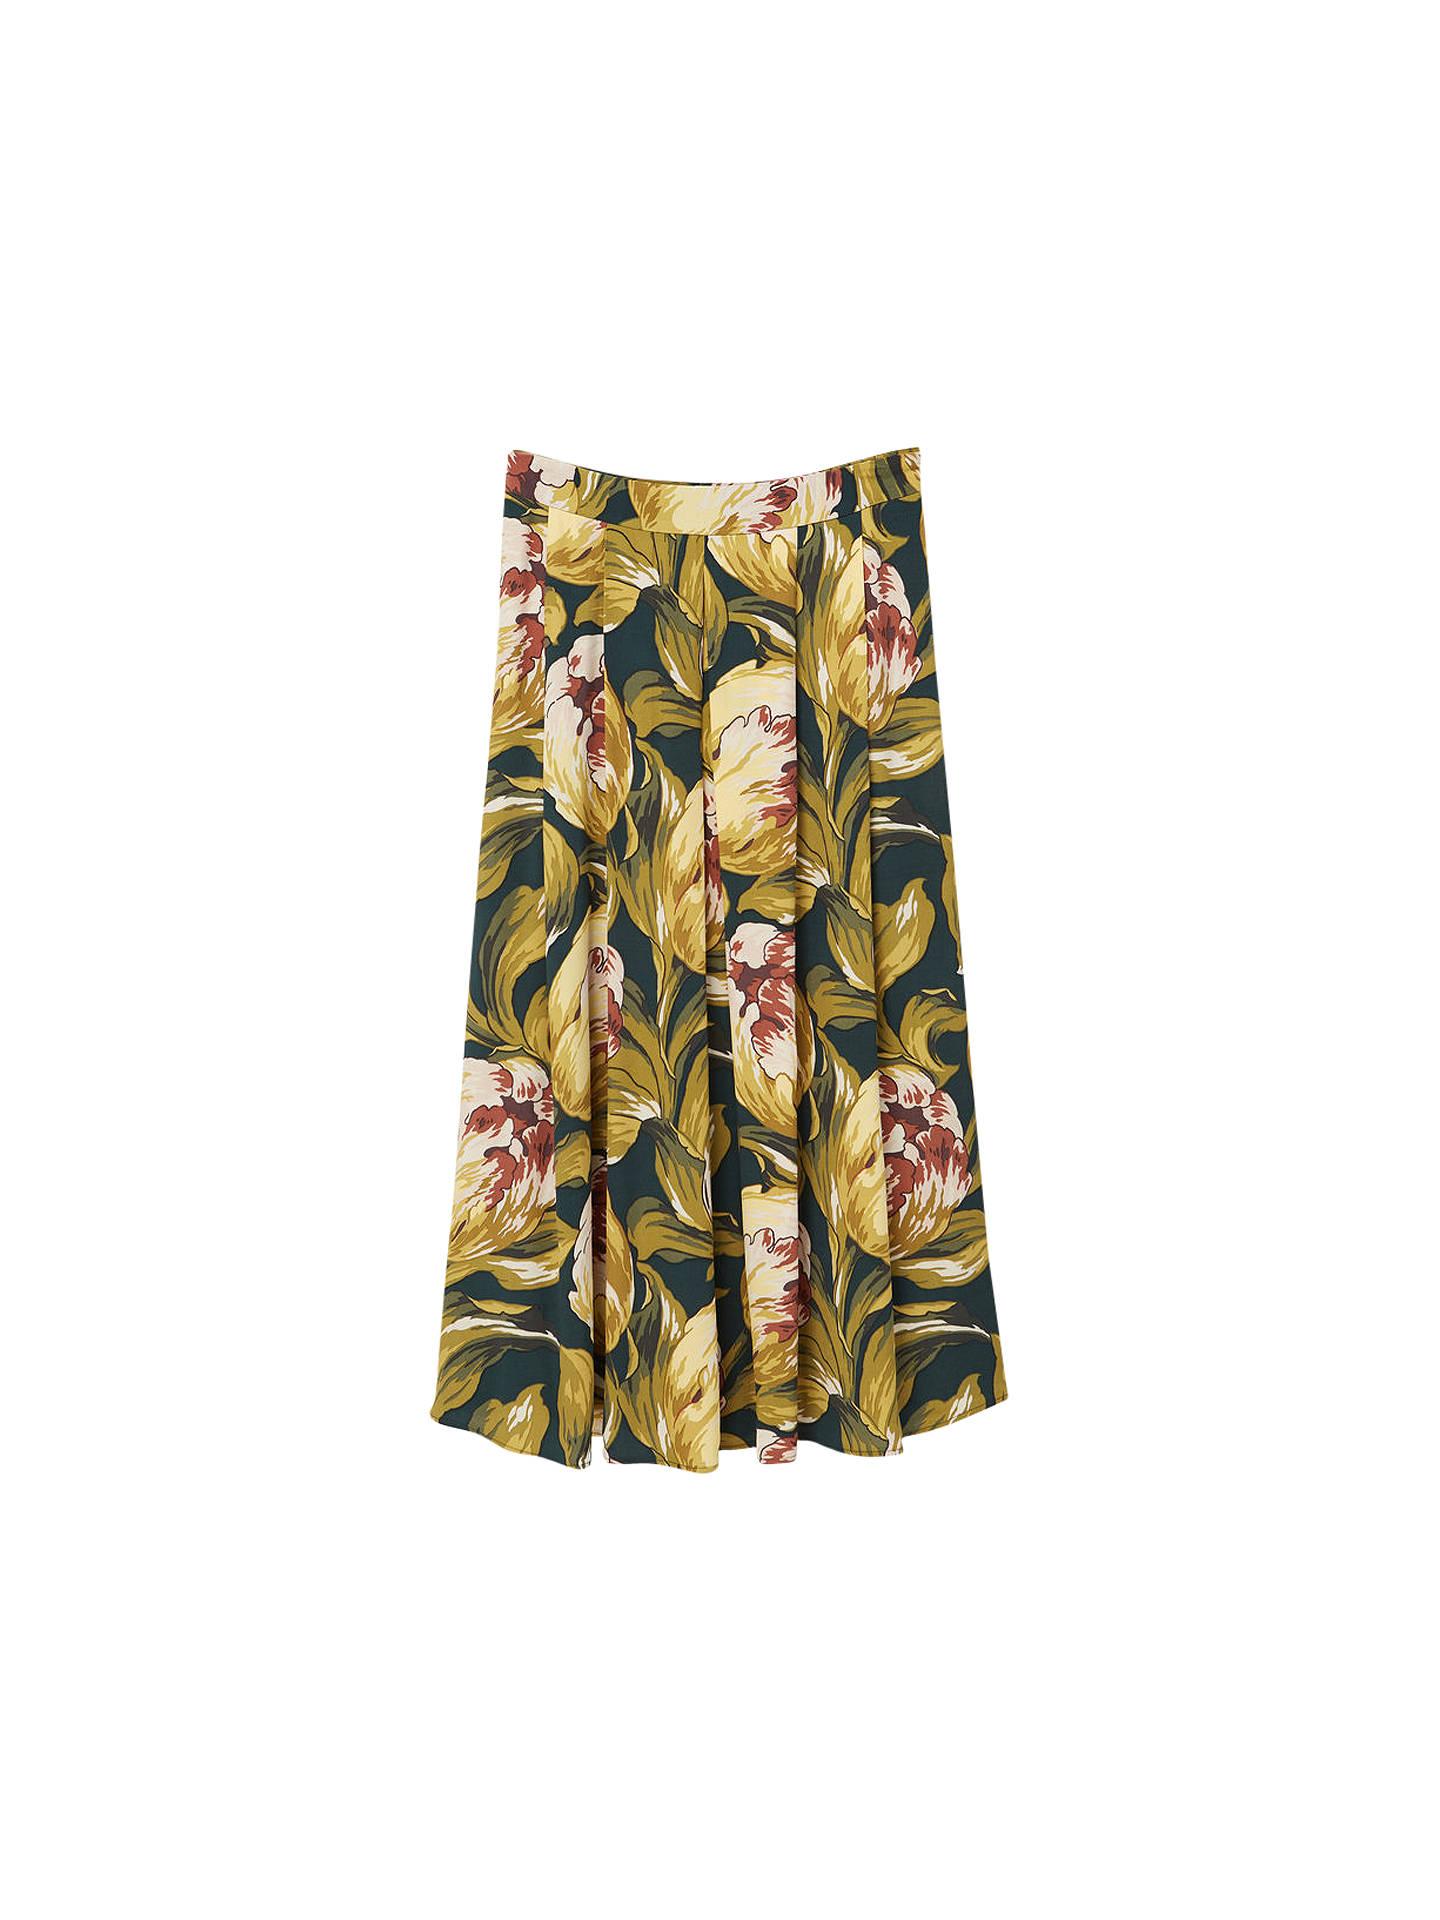 6e5aa325c Buy Mango Floral Midi Skirt, Green, 6 Online at johnlewis.com ...